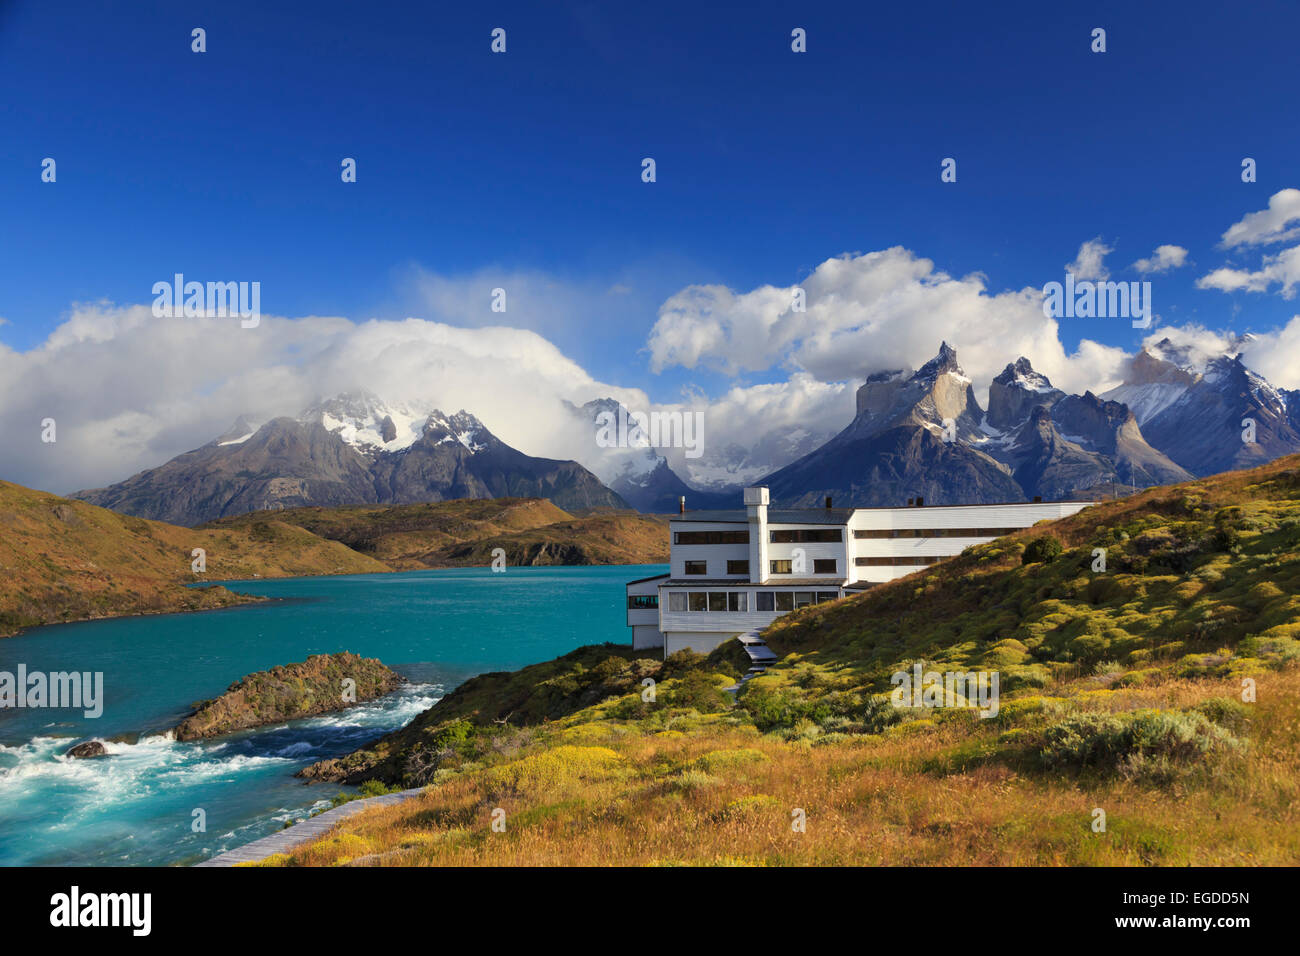 Chile, Patagonia, Torres del Paine National Park (UNESCO Site), Cuernos del Paine peaks and Luxury Hotel Explora - Stock Image